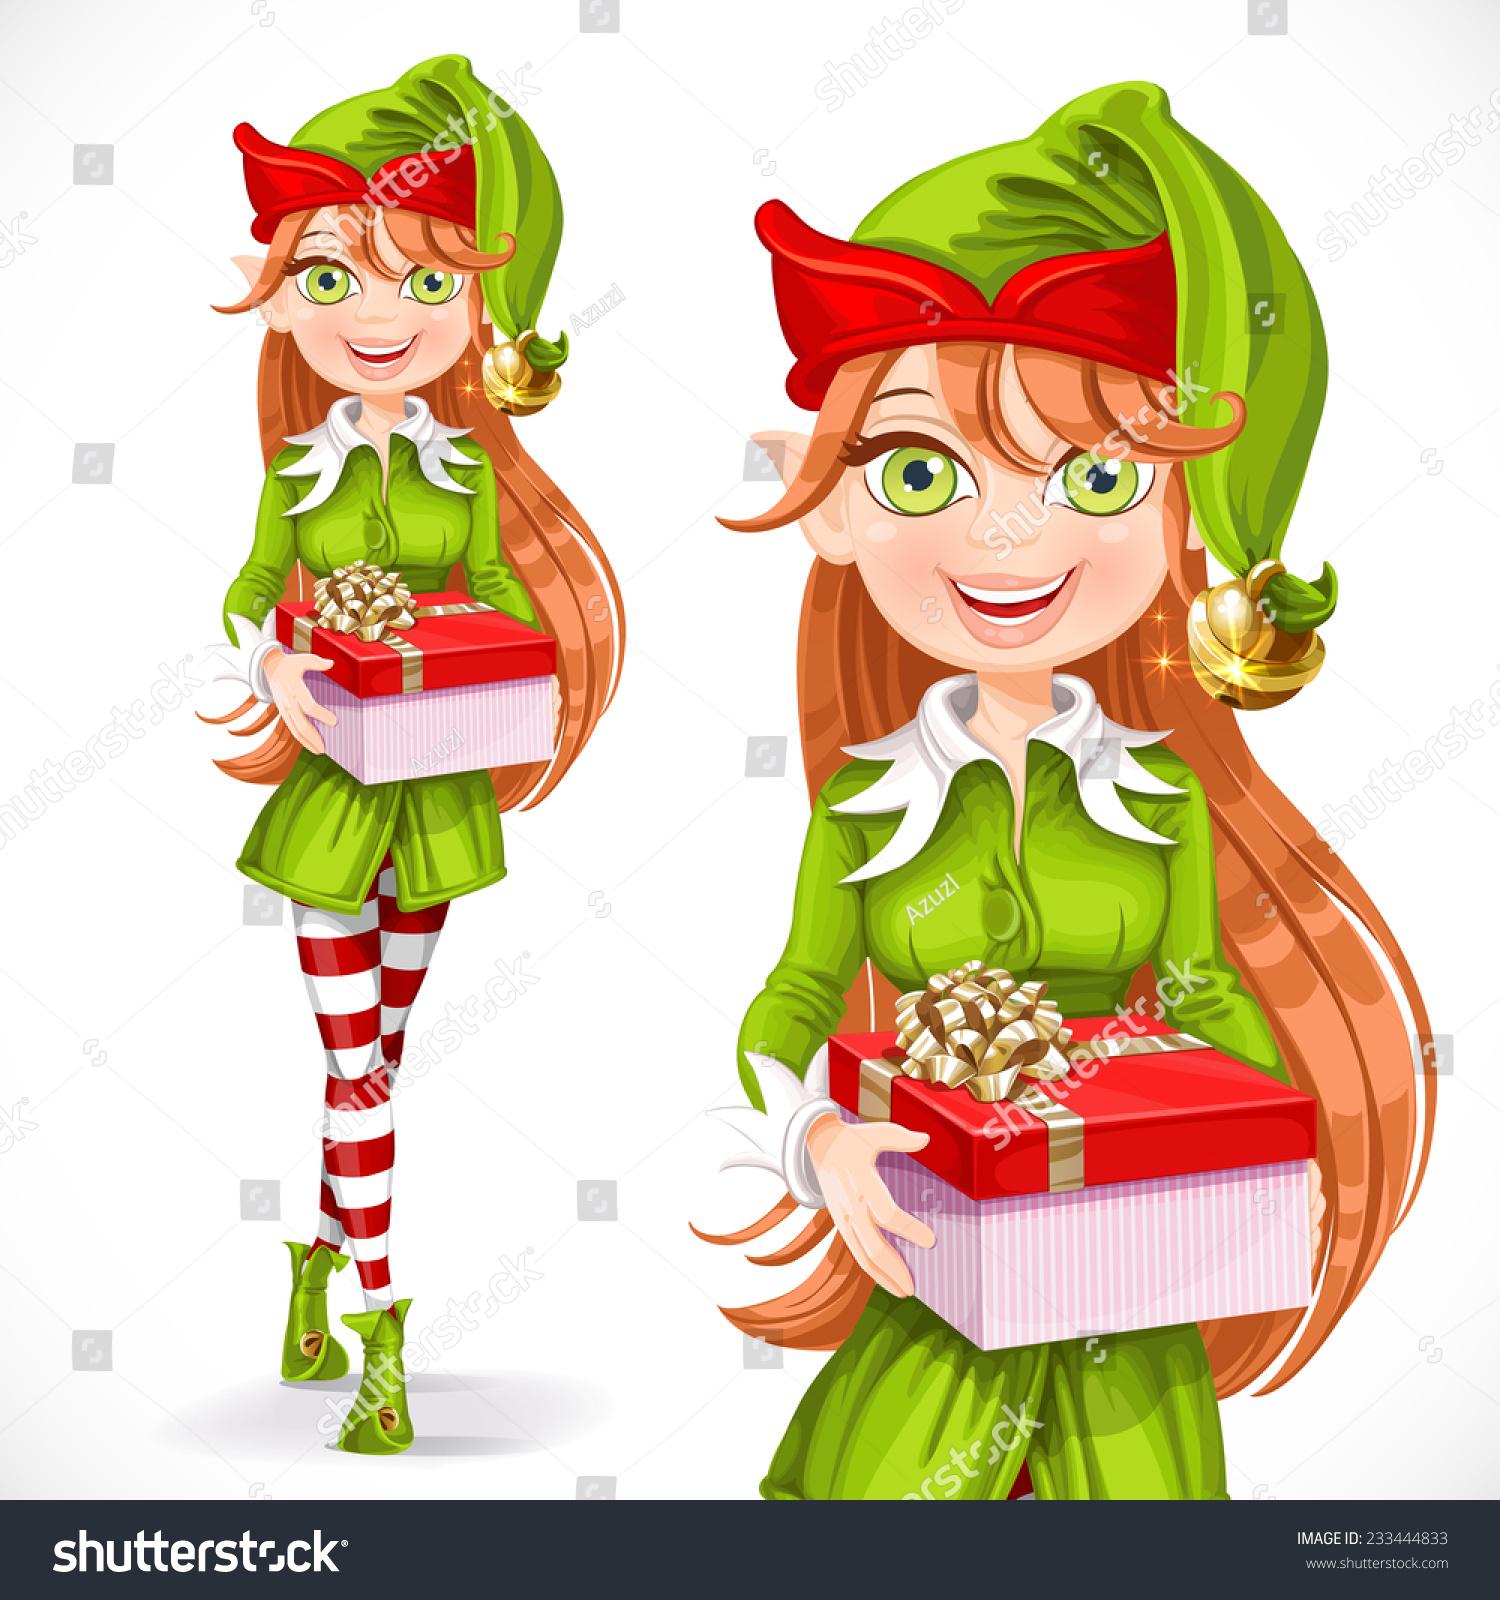 cute santa elf give gift stock vector 233444833 shutterstock